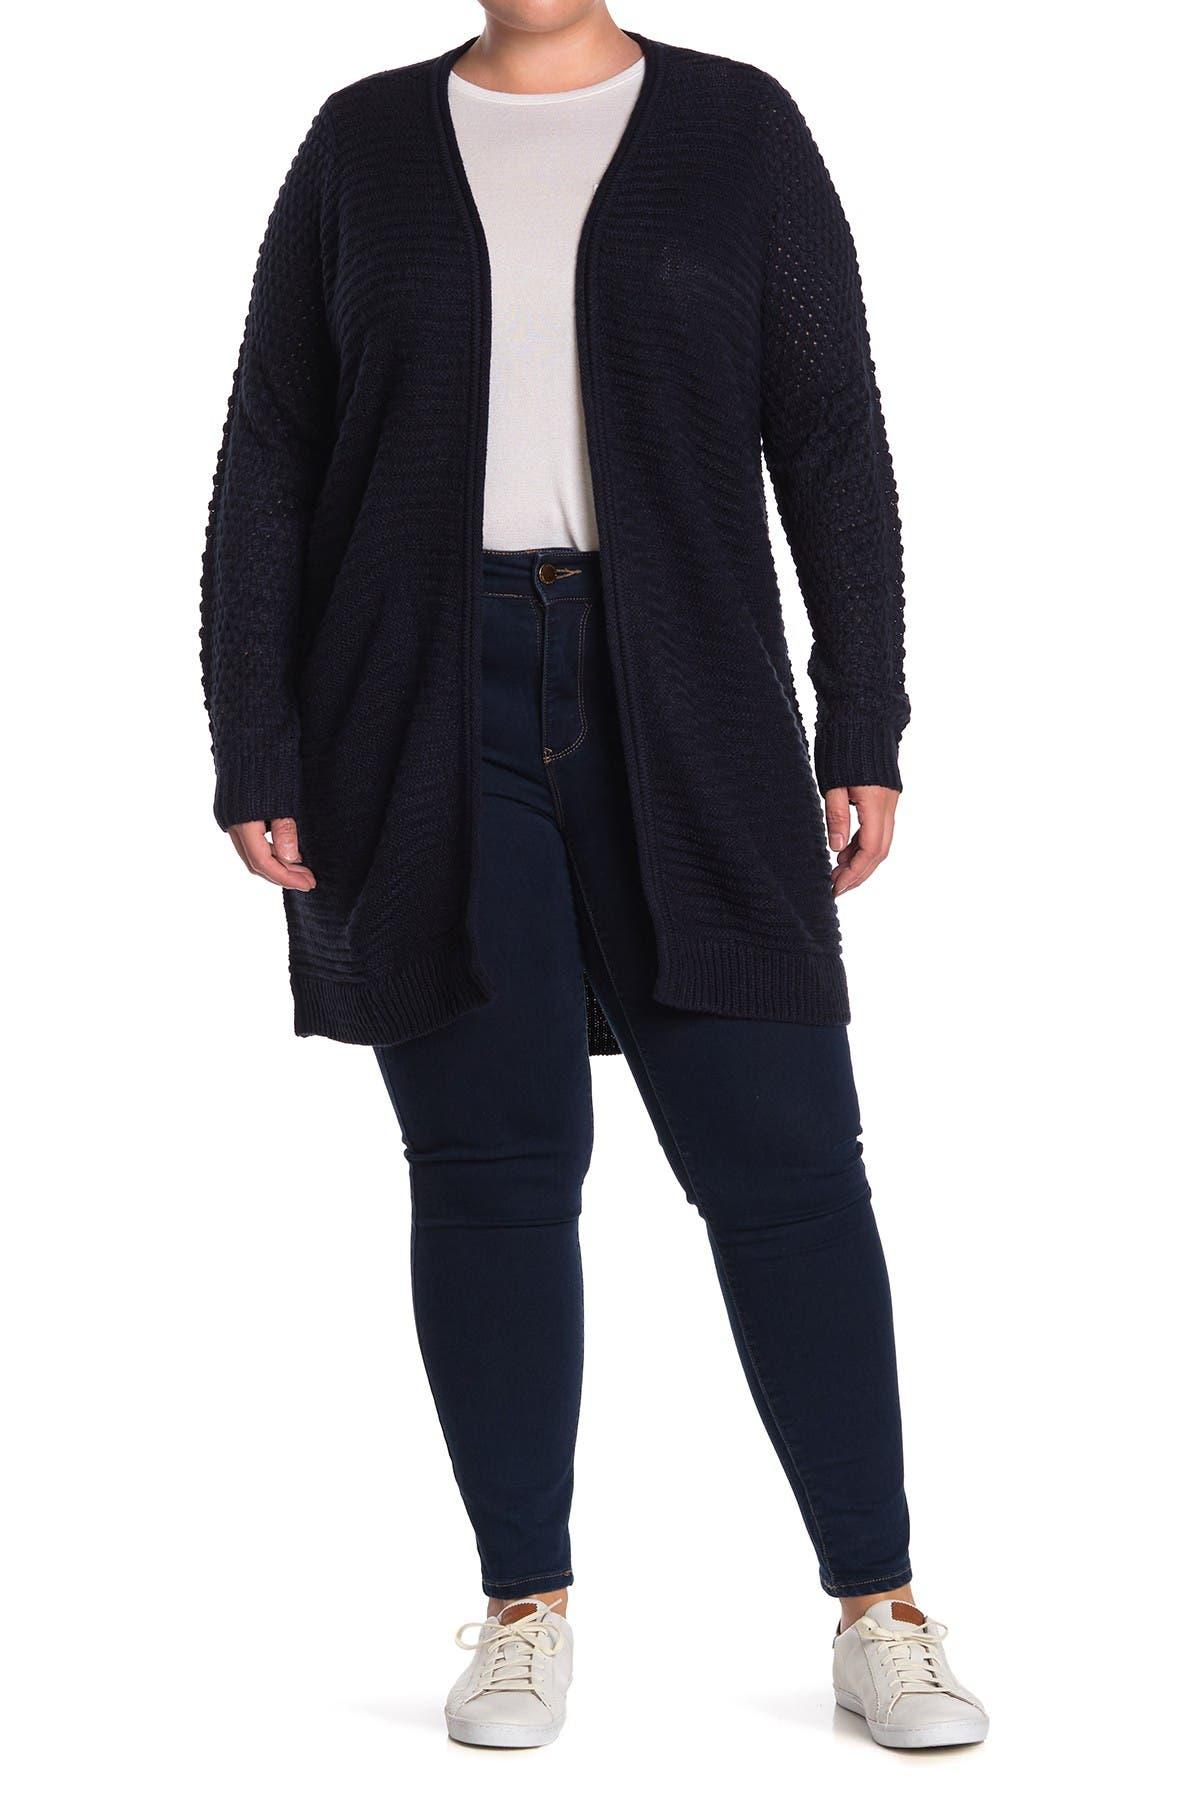 Image of VERO MODA Long Sleeve Open Cardigan